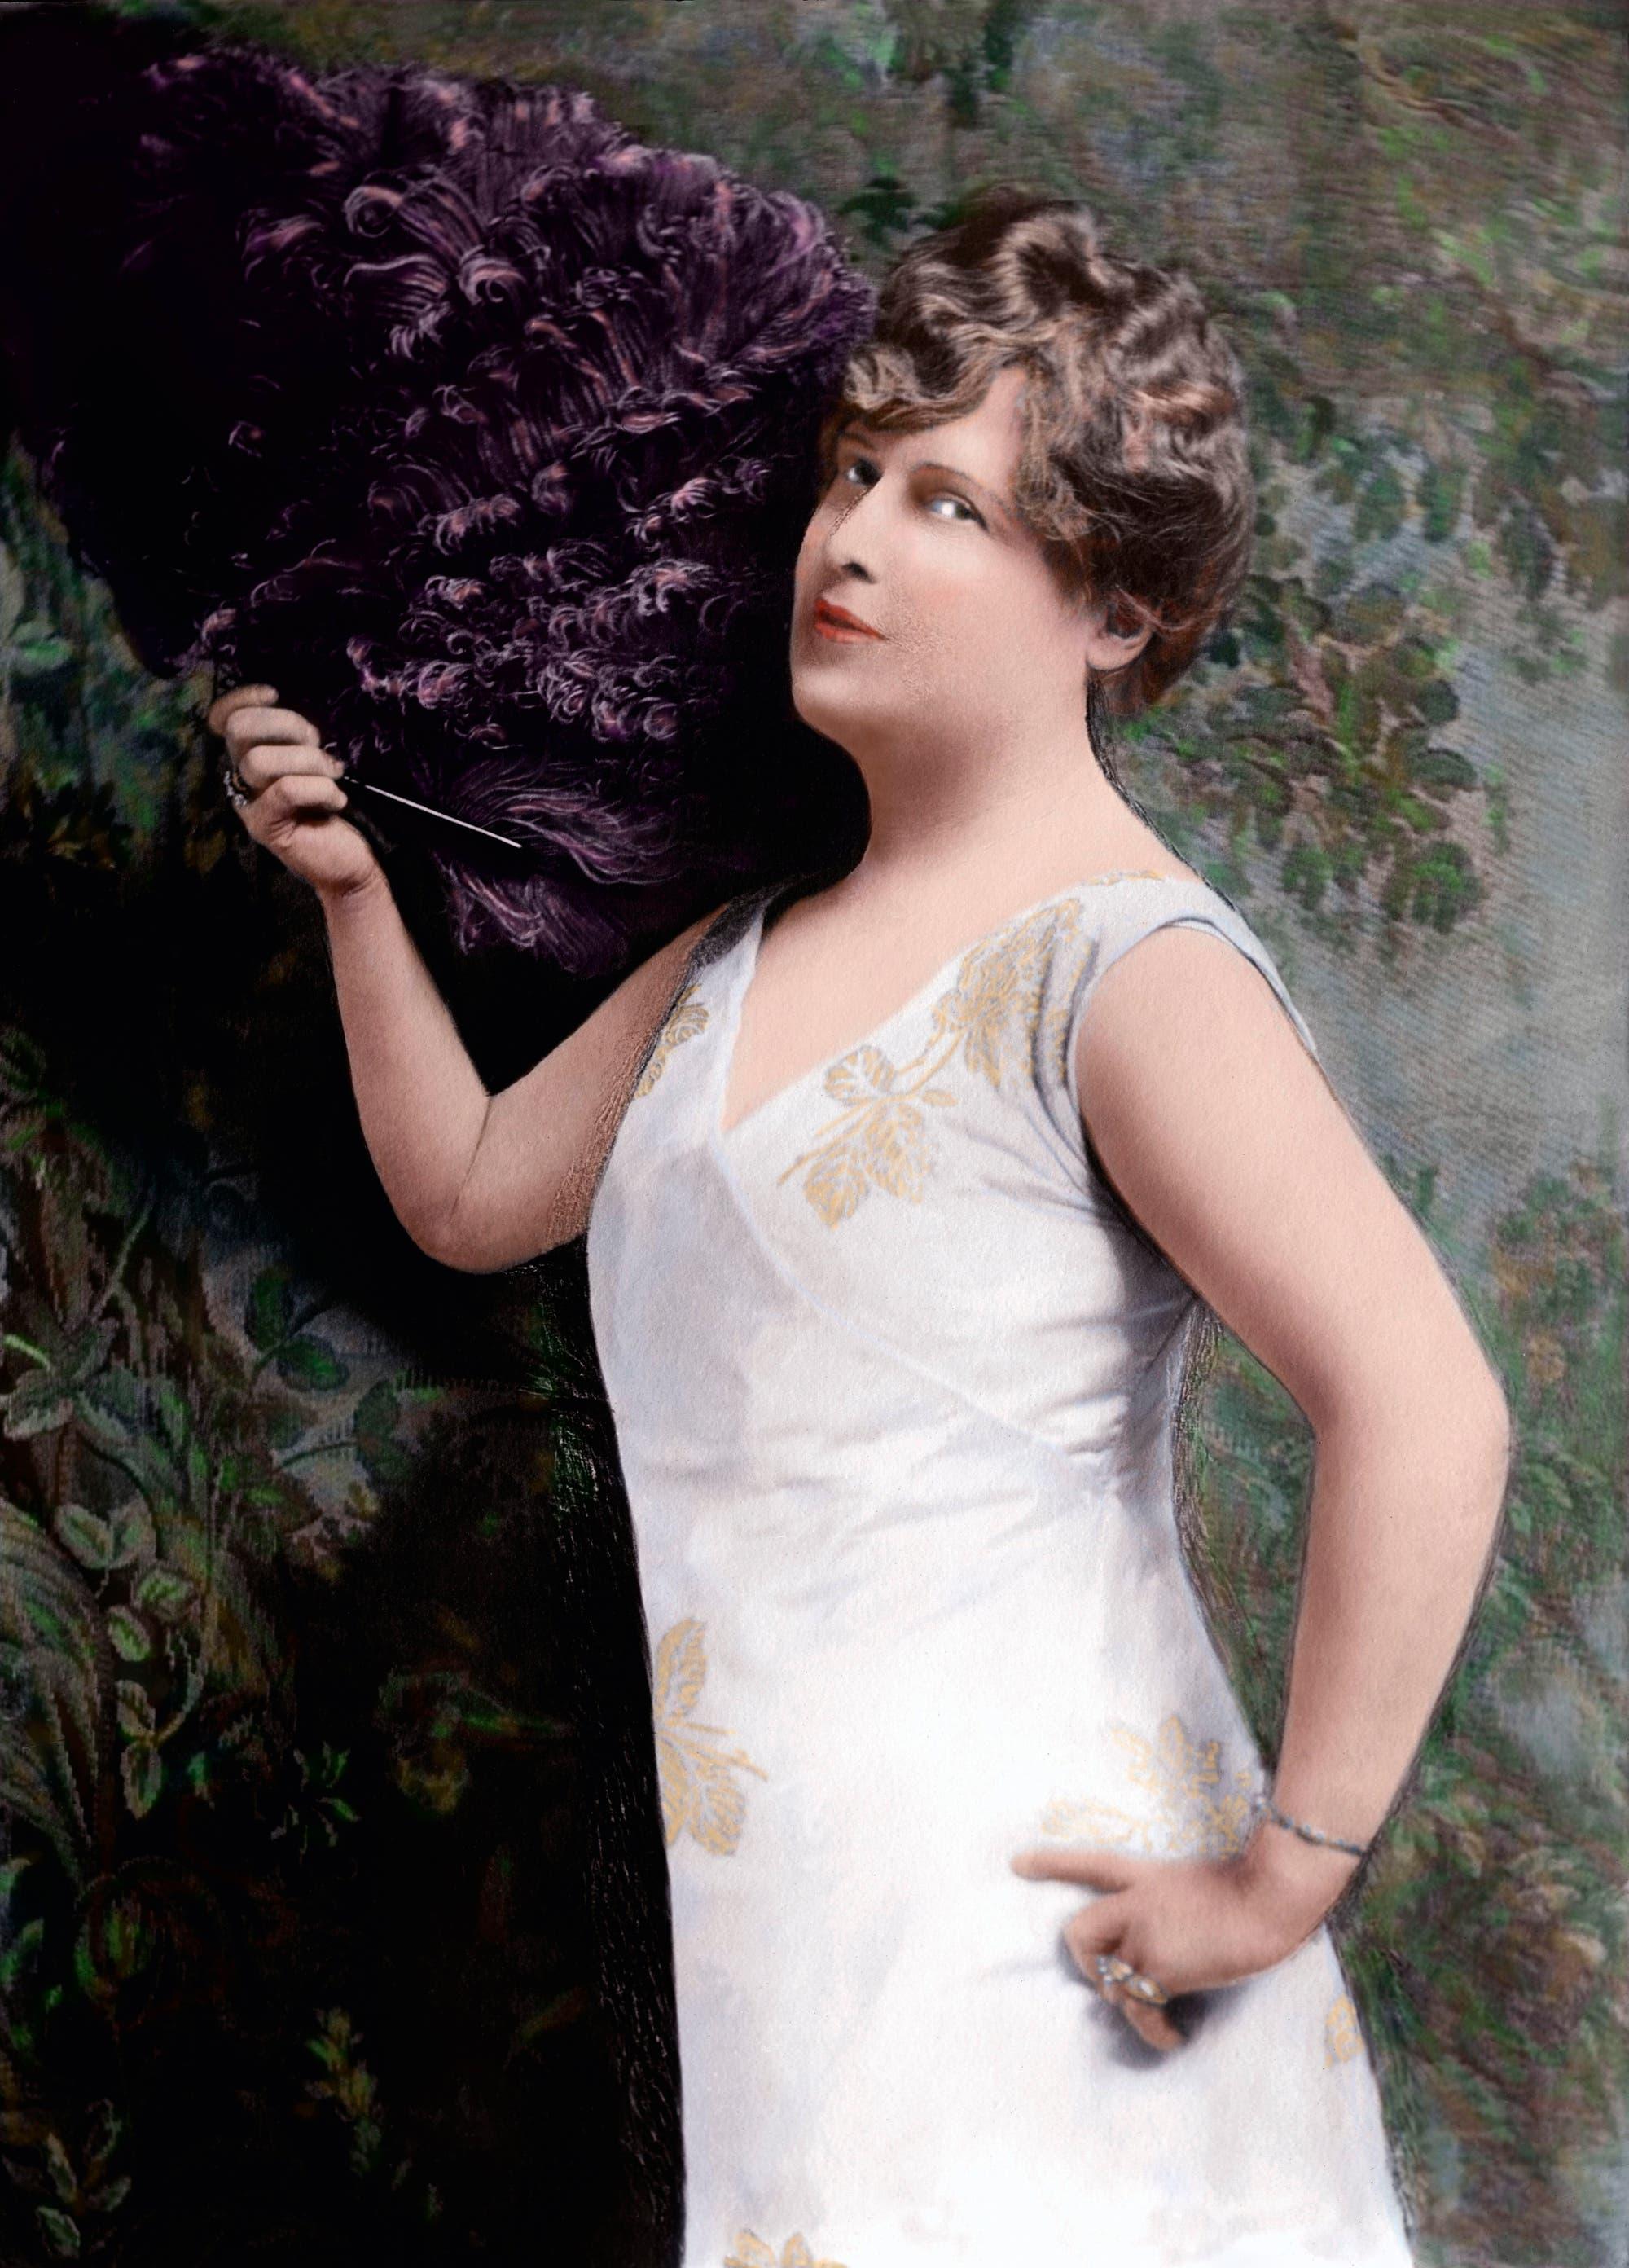 Diva Florence Foster Jenkins